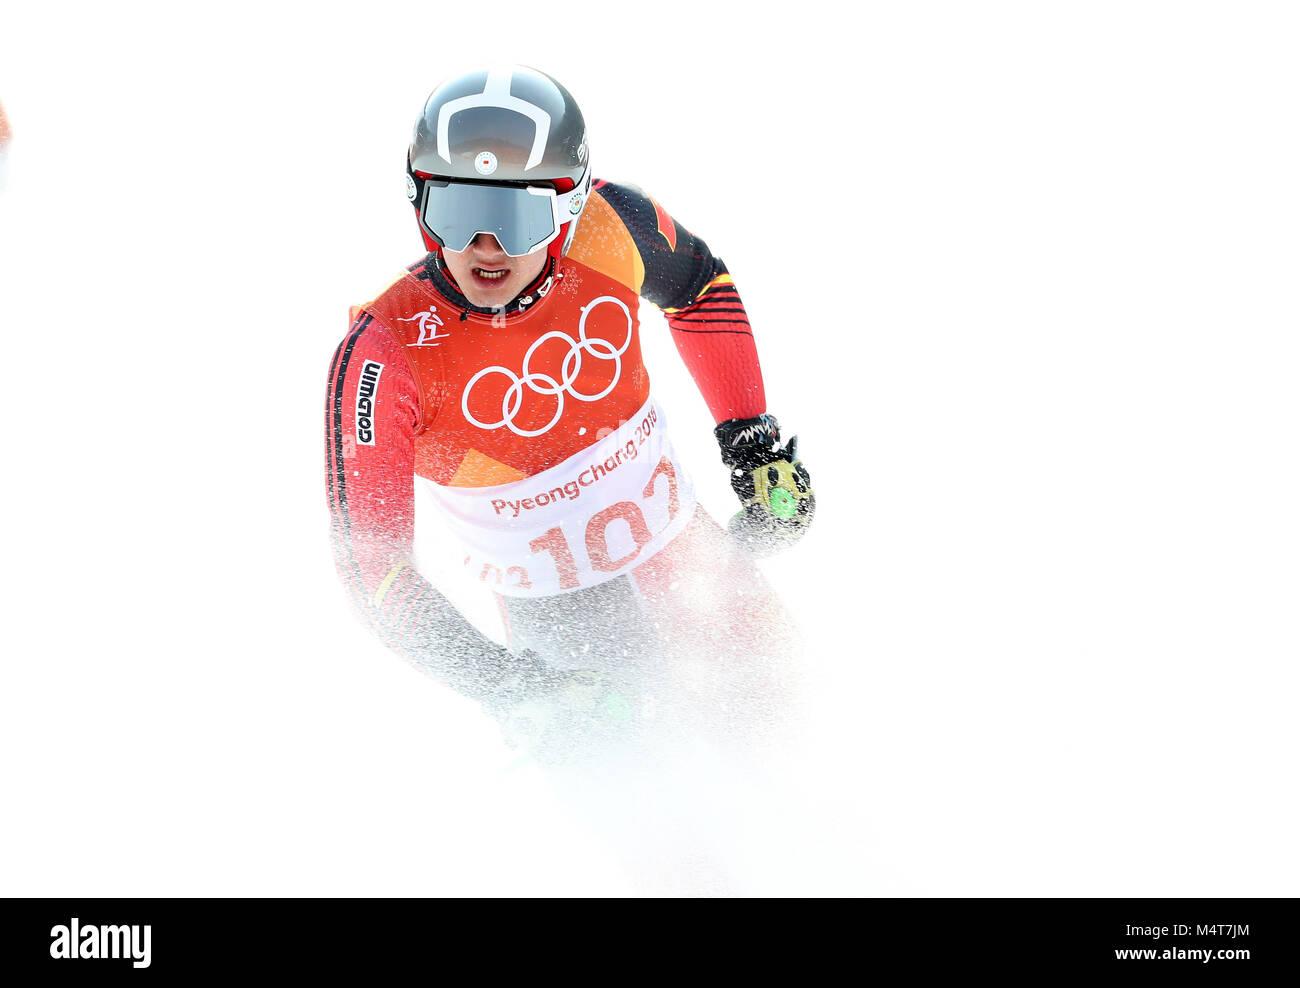 Pyeongchang, South Korea. 18th Feb, 2018. Zhang Yangming of China competes during the men's giant slalom of alpine Stock Photo